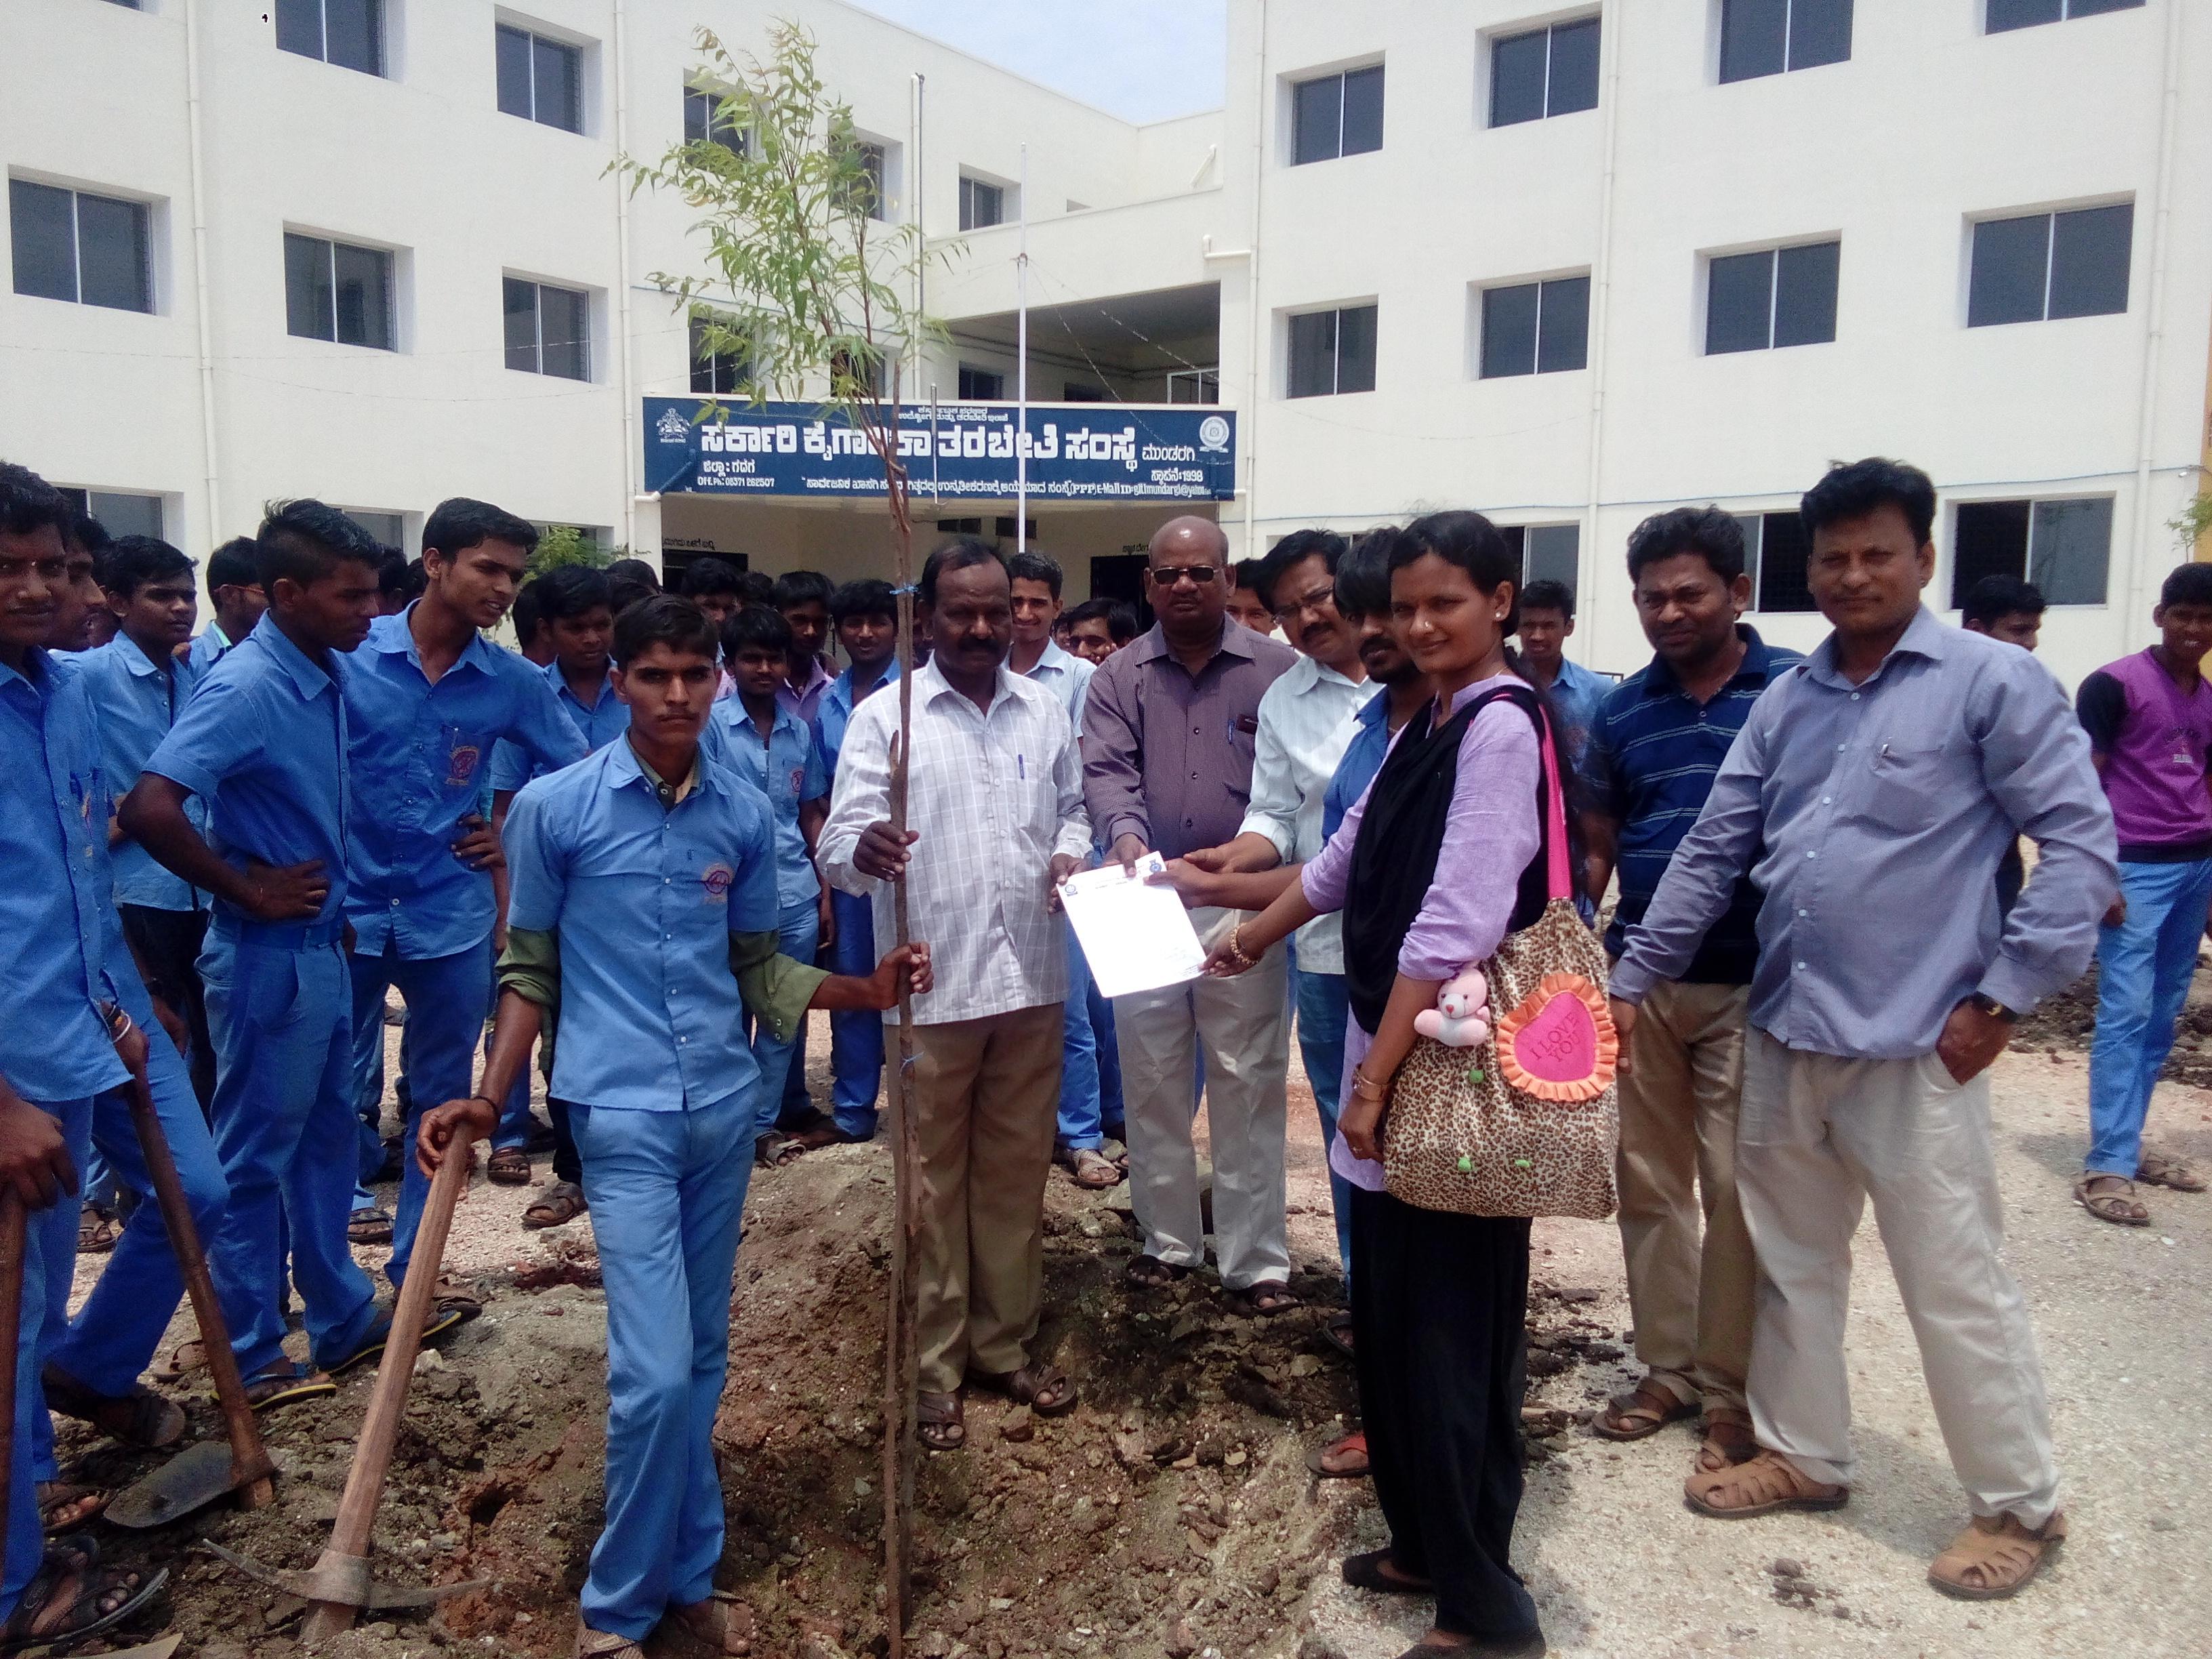 /media/nirmalavss/1NGO-00290-Nirmala_Vivedodeshagala_Seva_Samsthe-Activities-World_Environment_Day_Program.jpg